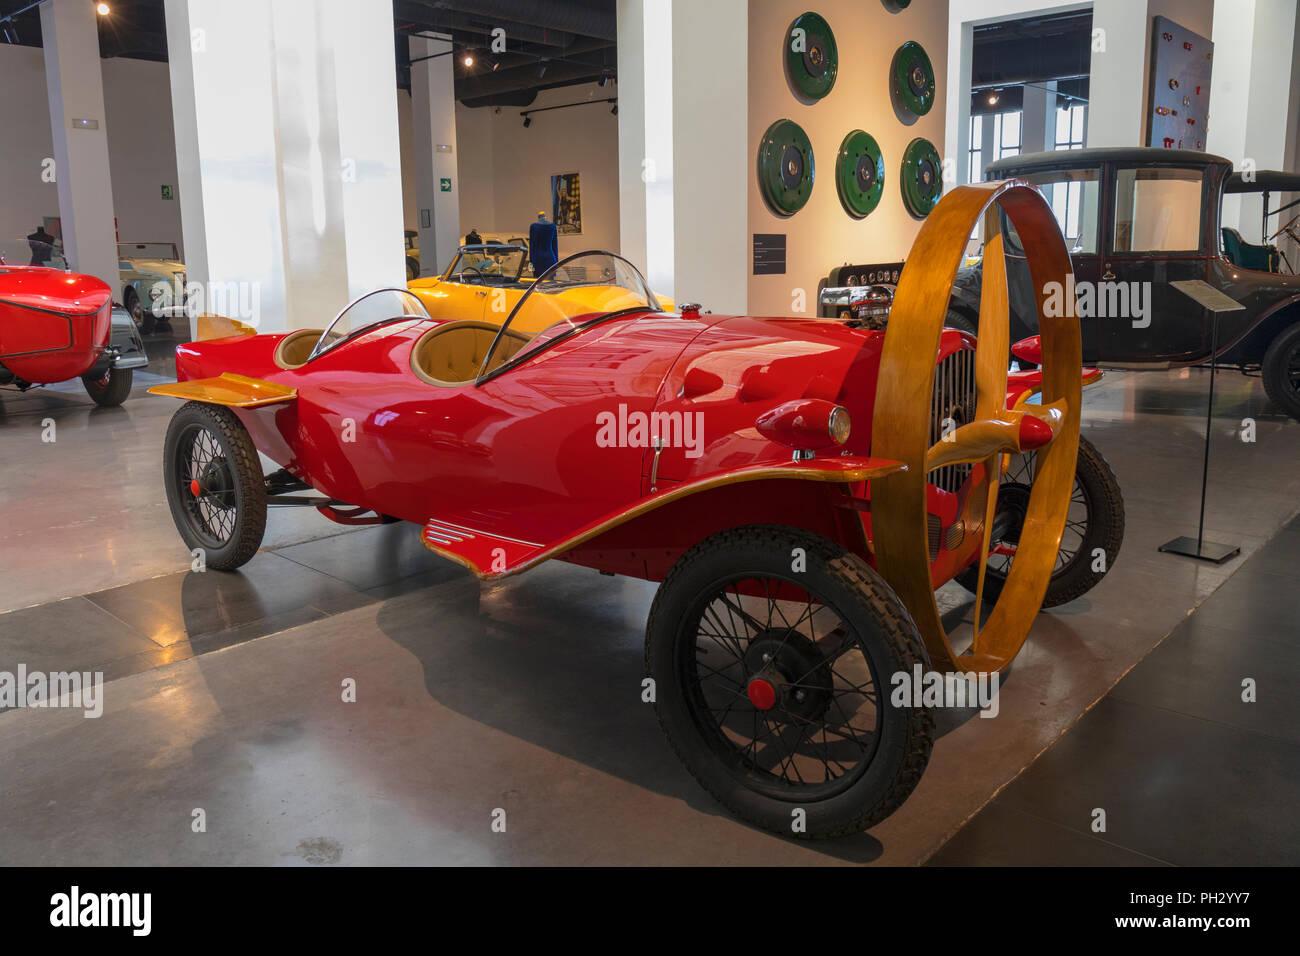 Museo Automovilistico y de la Moda, Malaga, Malaga Province, Spain.  Automobile and Fashion Museum.  Prototype of the propeller driven Helicron 2, bui - Stock Image